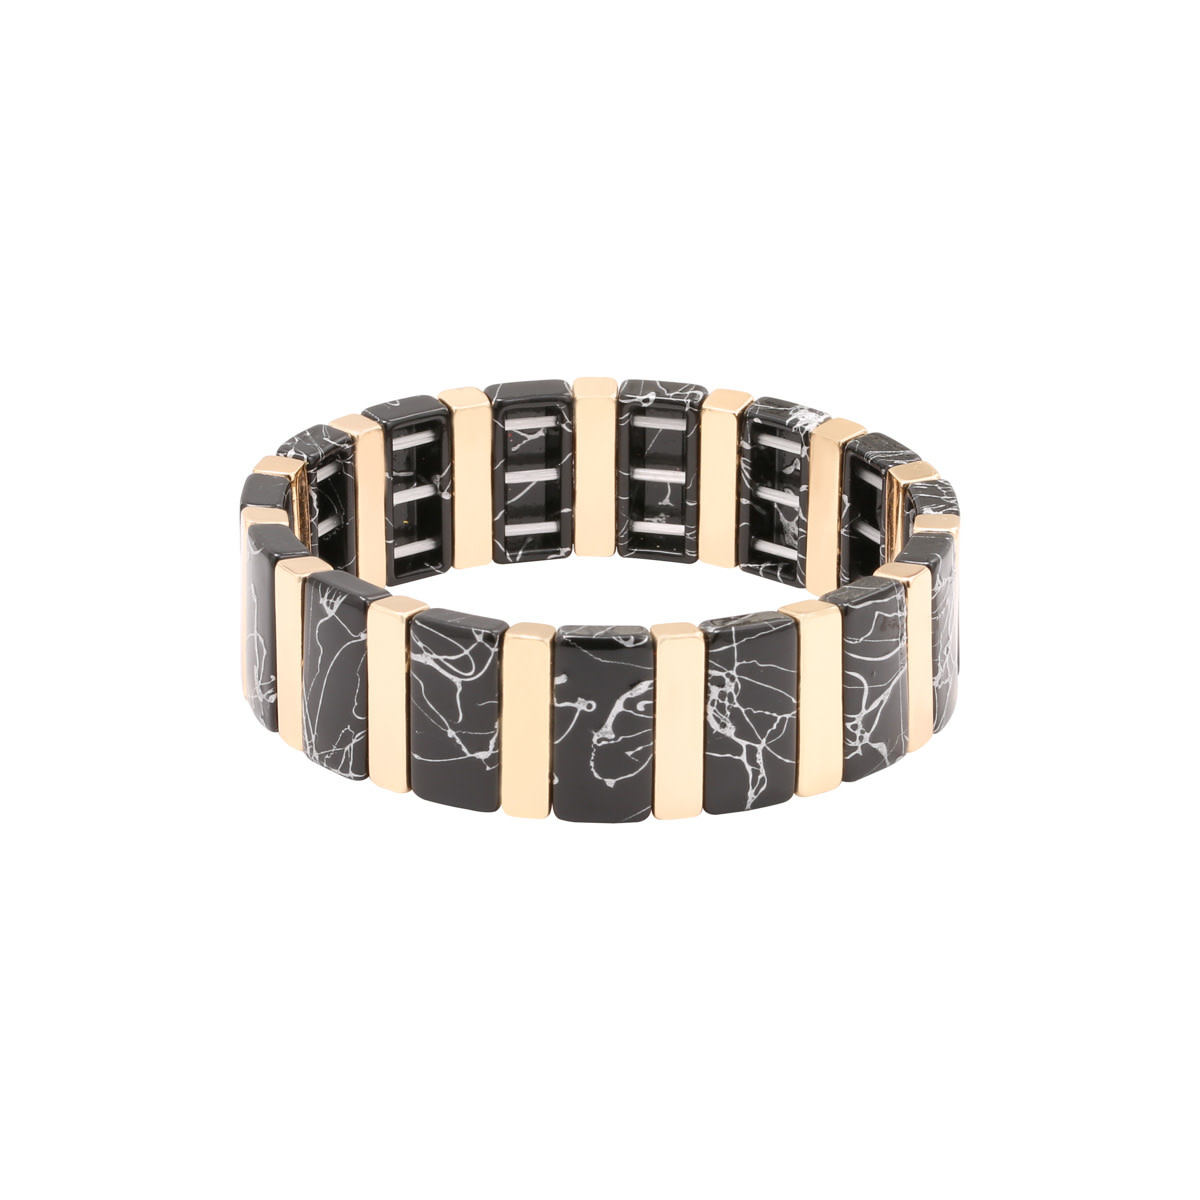 Ladybugs Armband stainless steel elastiek met marmer kralen GOUD/ZWART 3